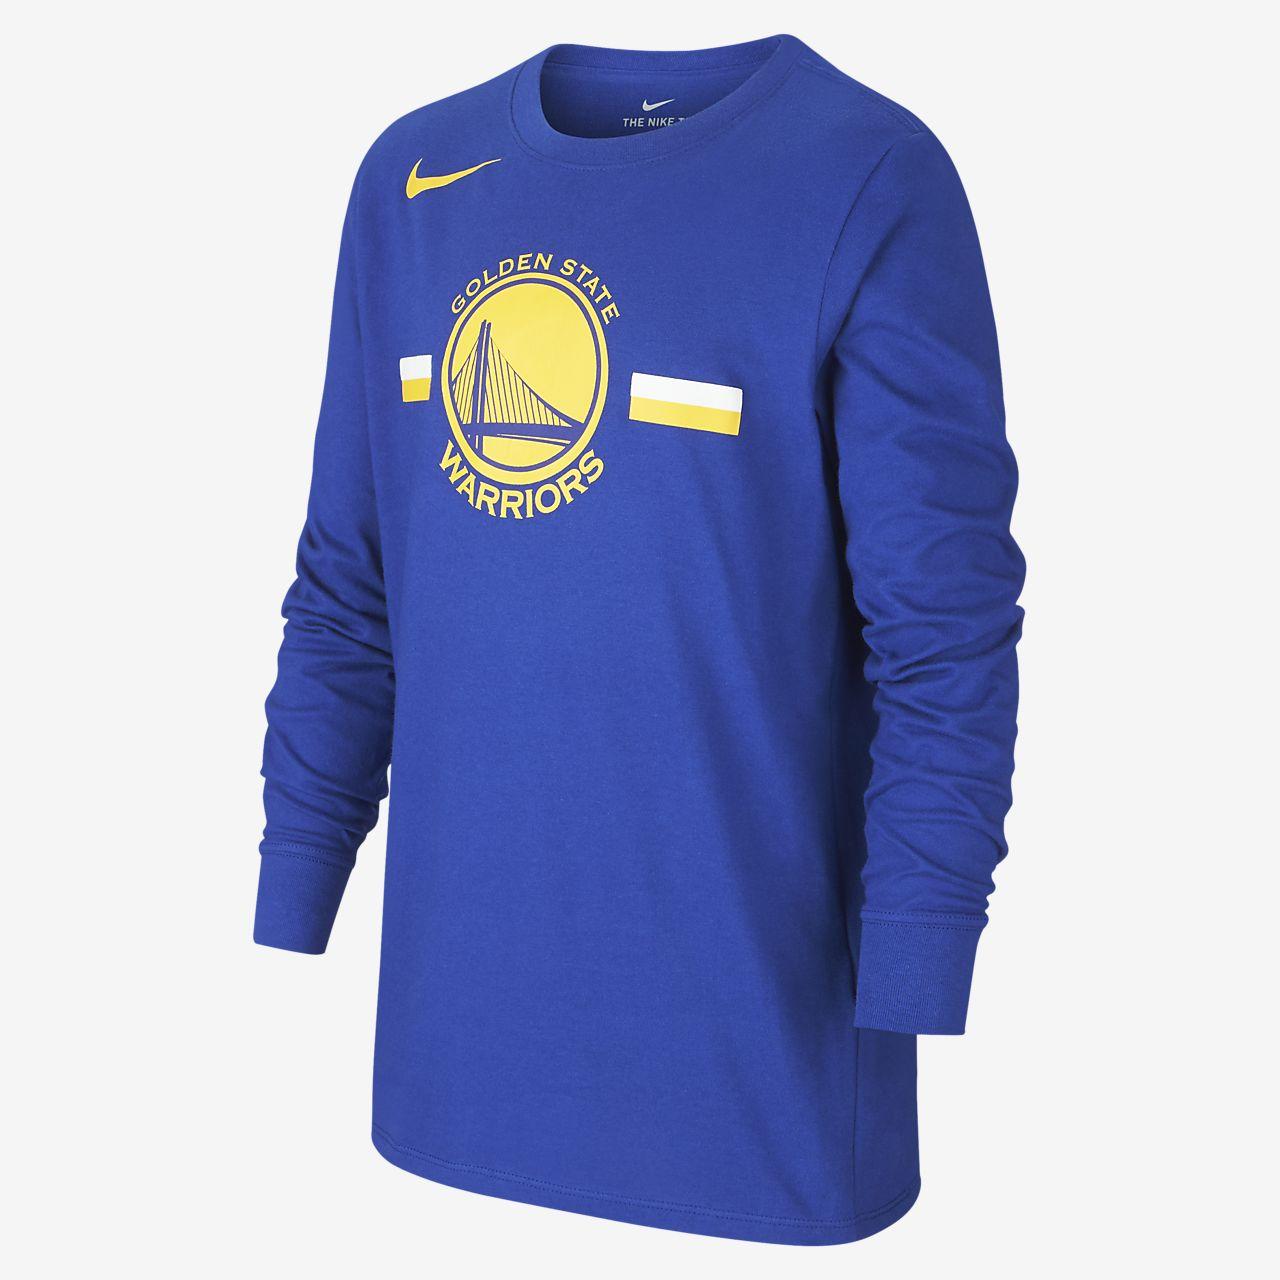 Golden State Warriors Nike Dri-FIT Logo Older Kids' Long-Sleeve NBA T-Shirt